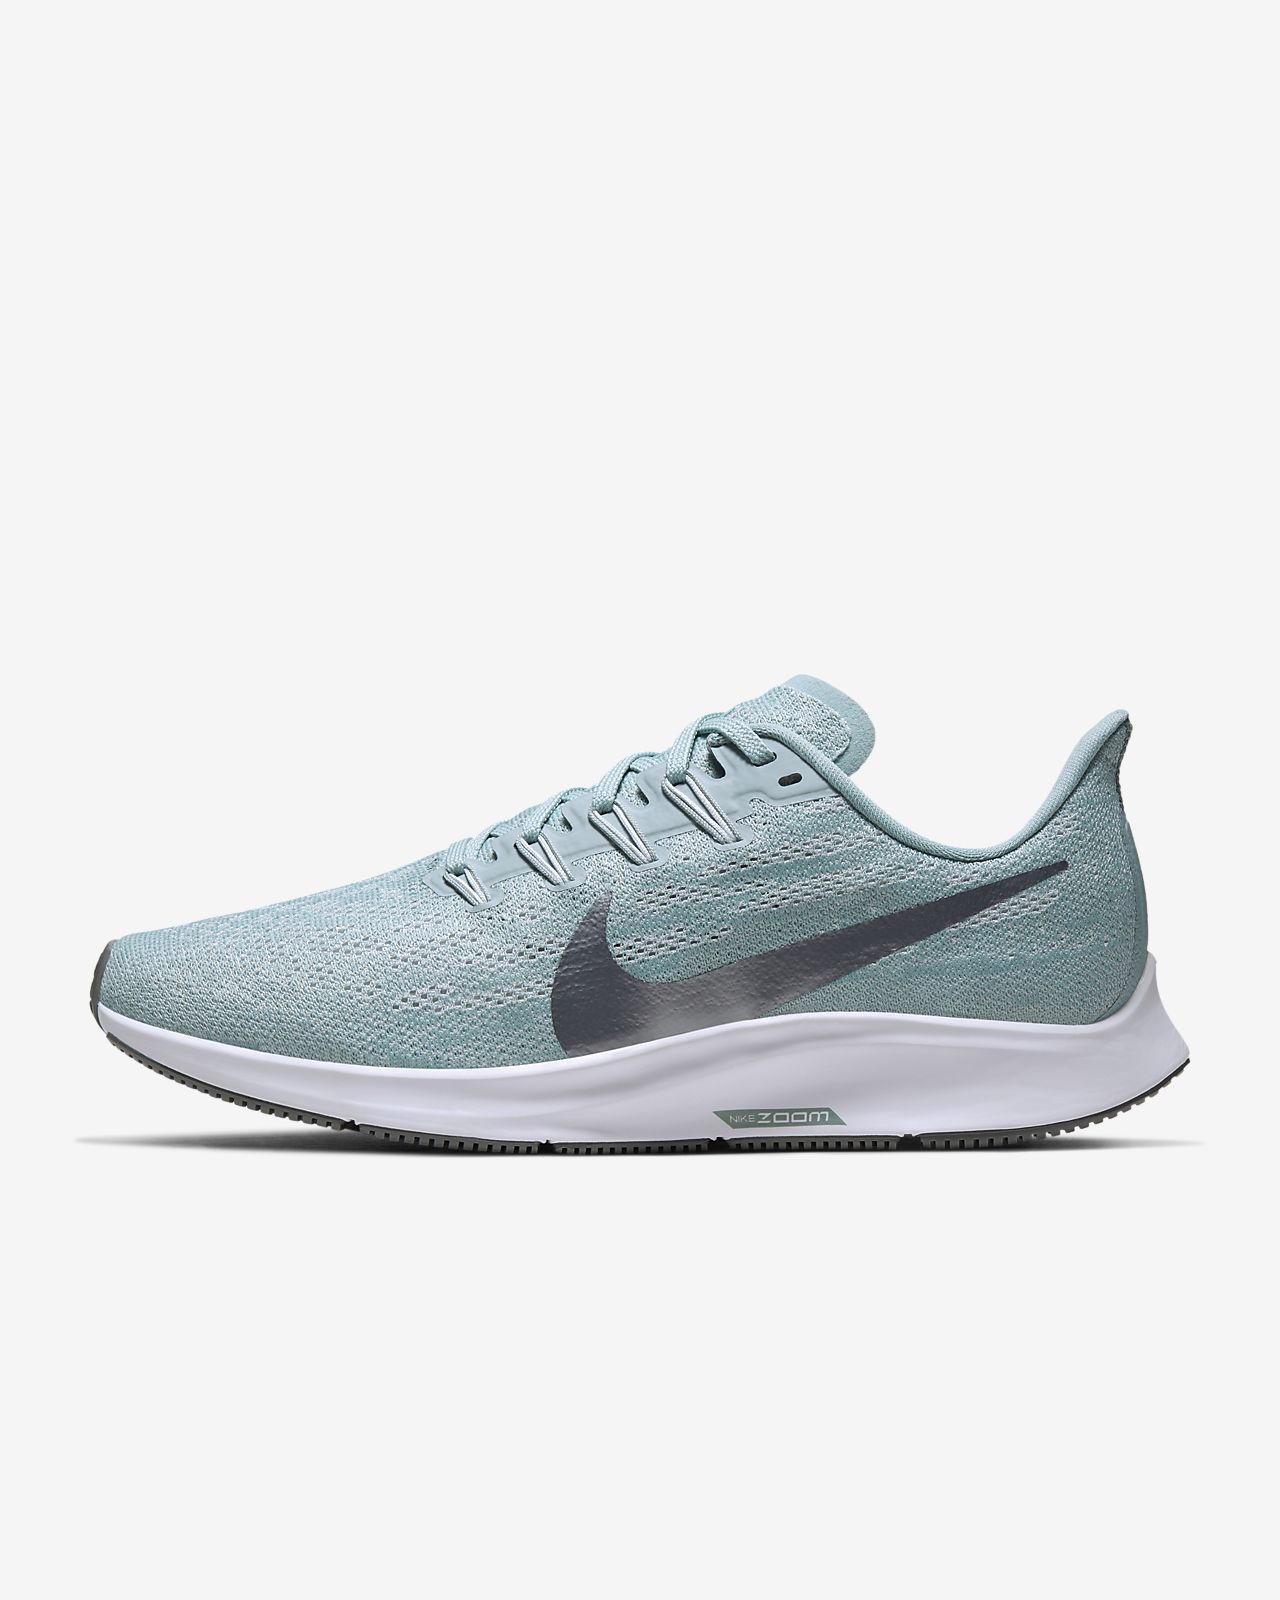 suave y ligero sombras de online Nike Air Zoom Pegasus 36 Women's Running Shoe. Nike.com